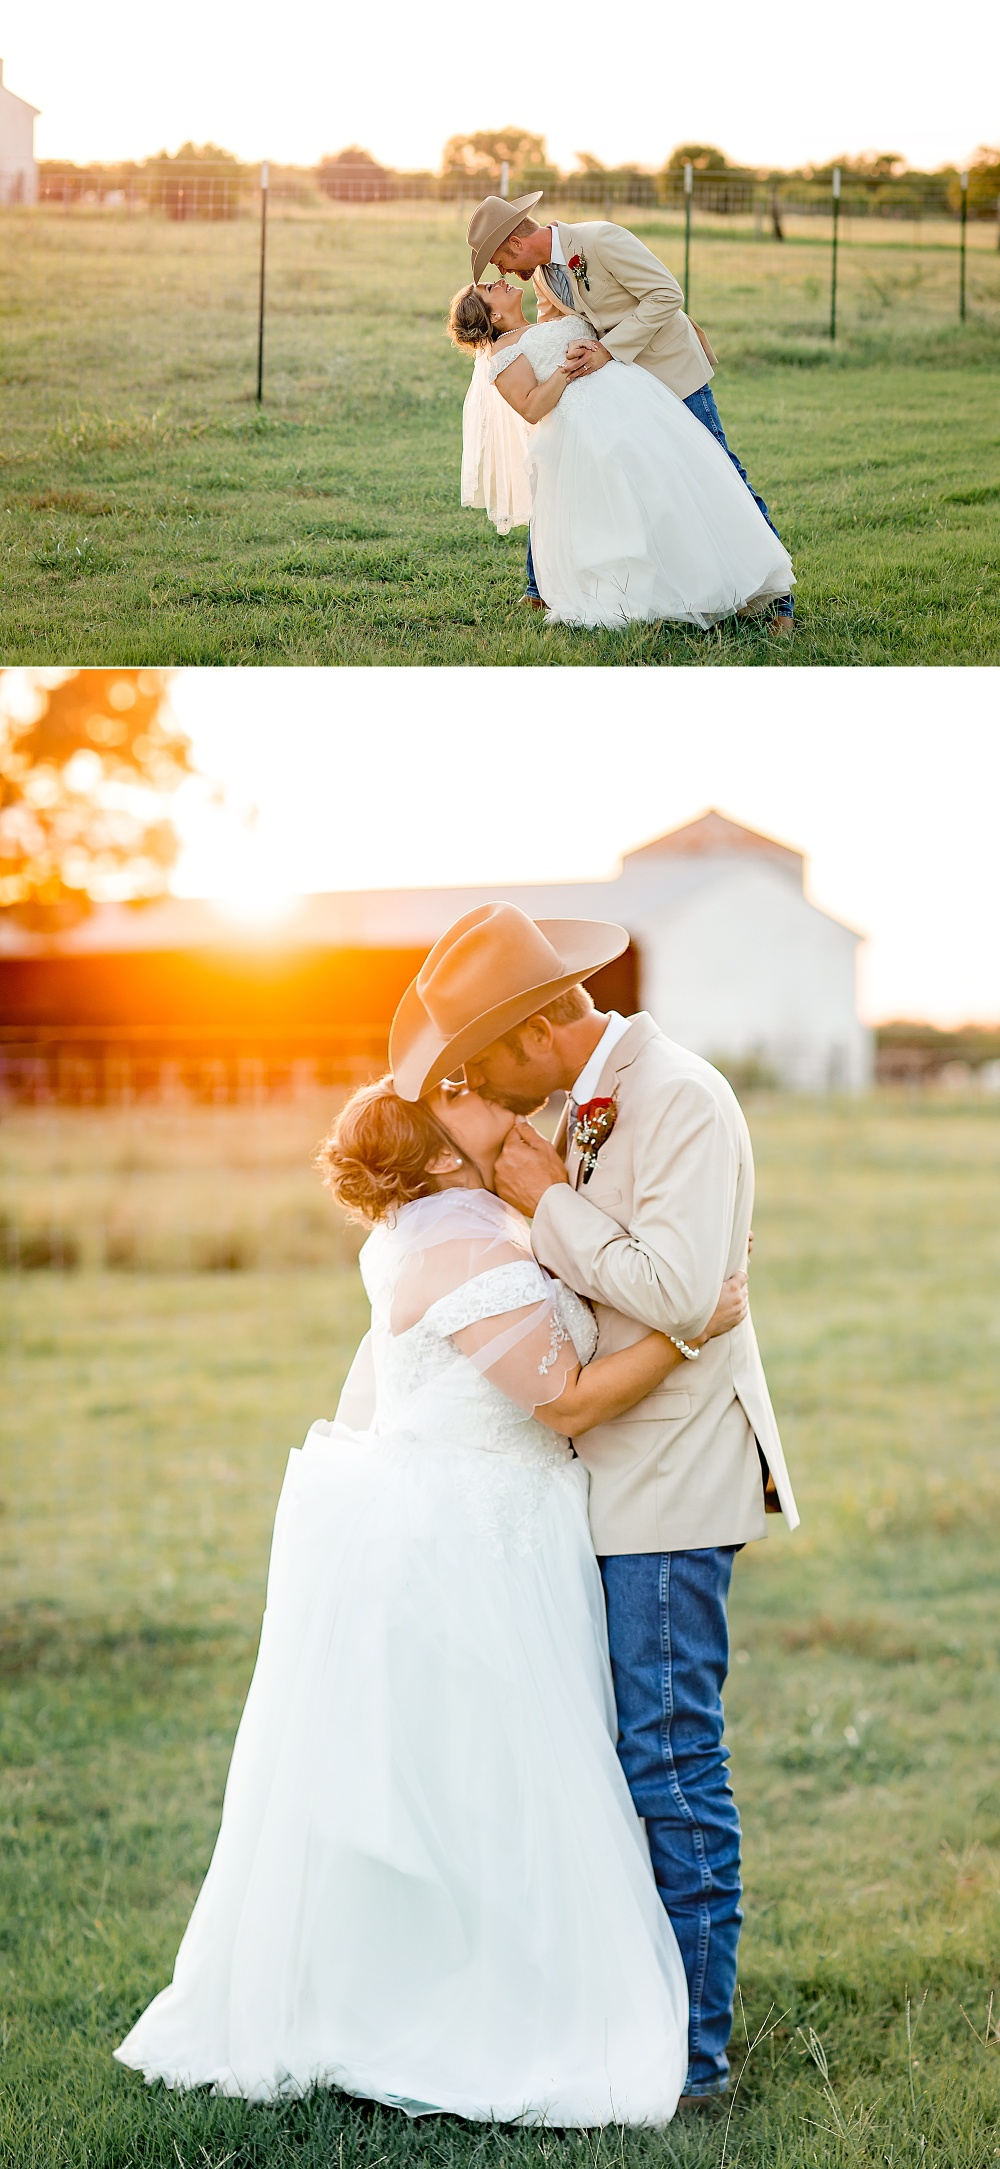 Wedding-Photographer-Rustic-Sunflower-theme-Texas-Carly-Barton-Photography_0106.jpg